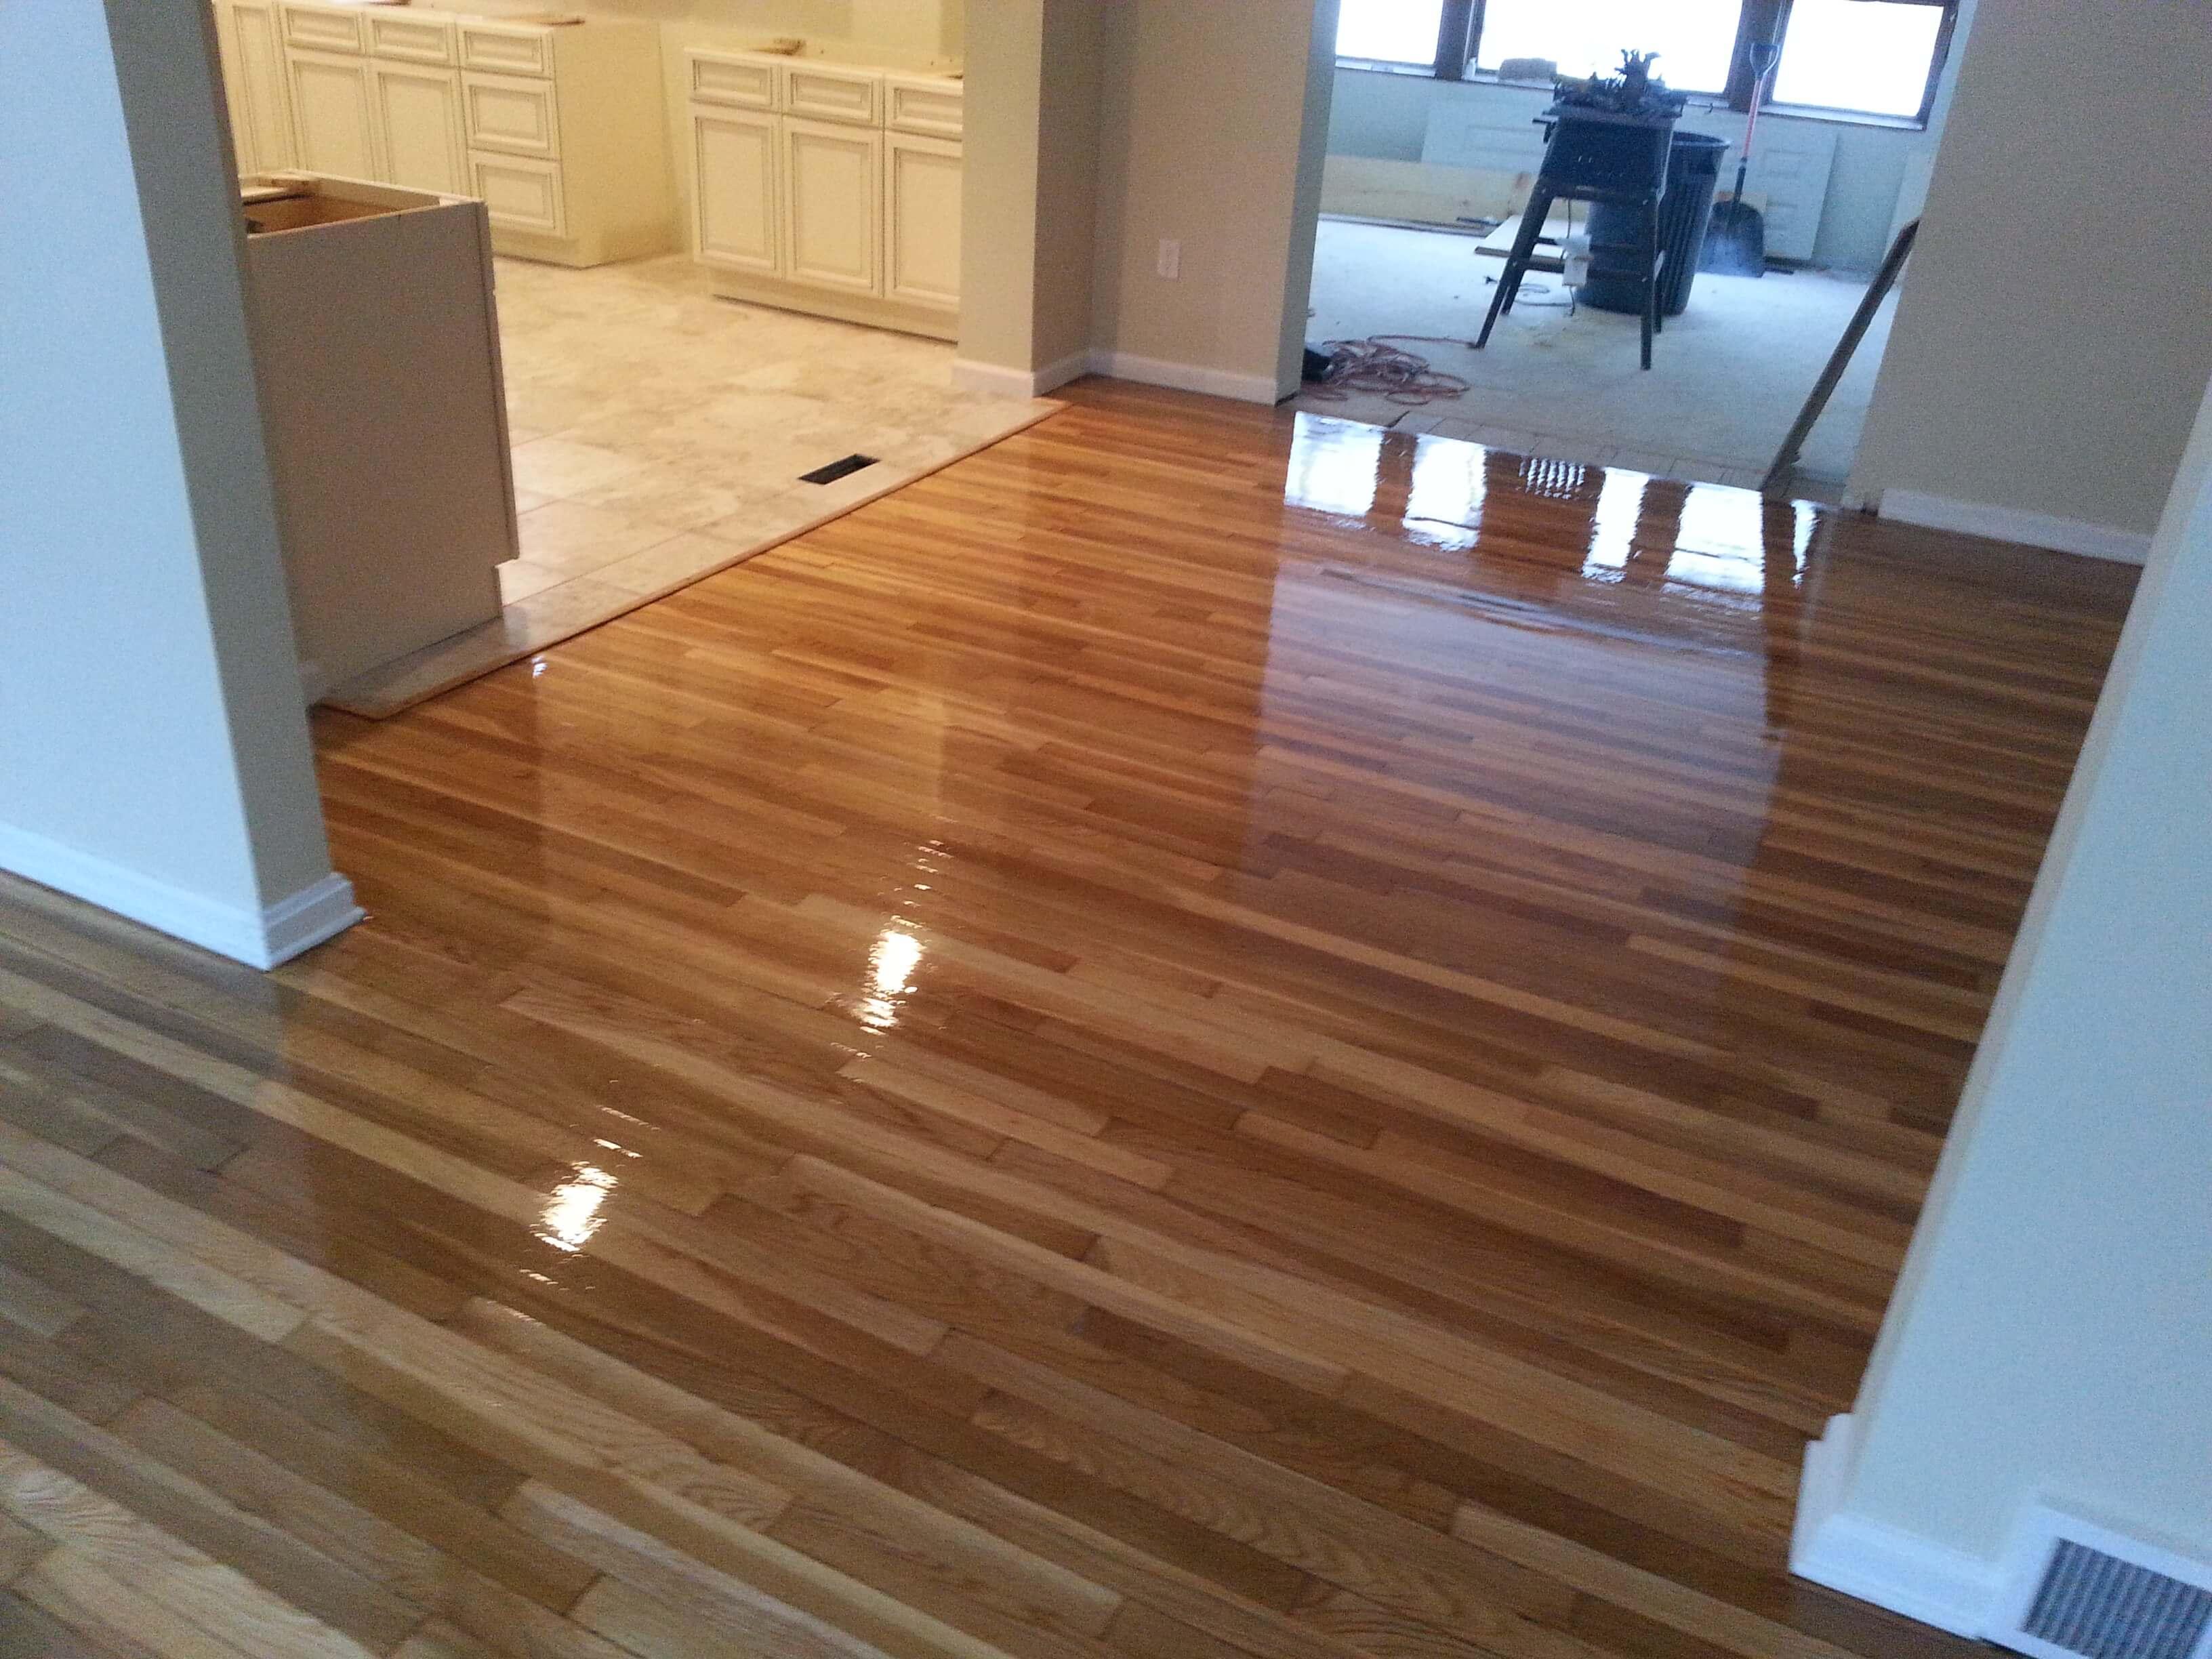 hardwood floor resurfacing in nashville, tn